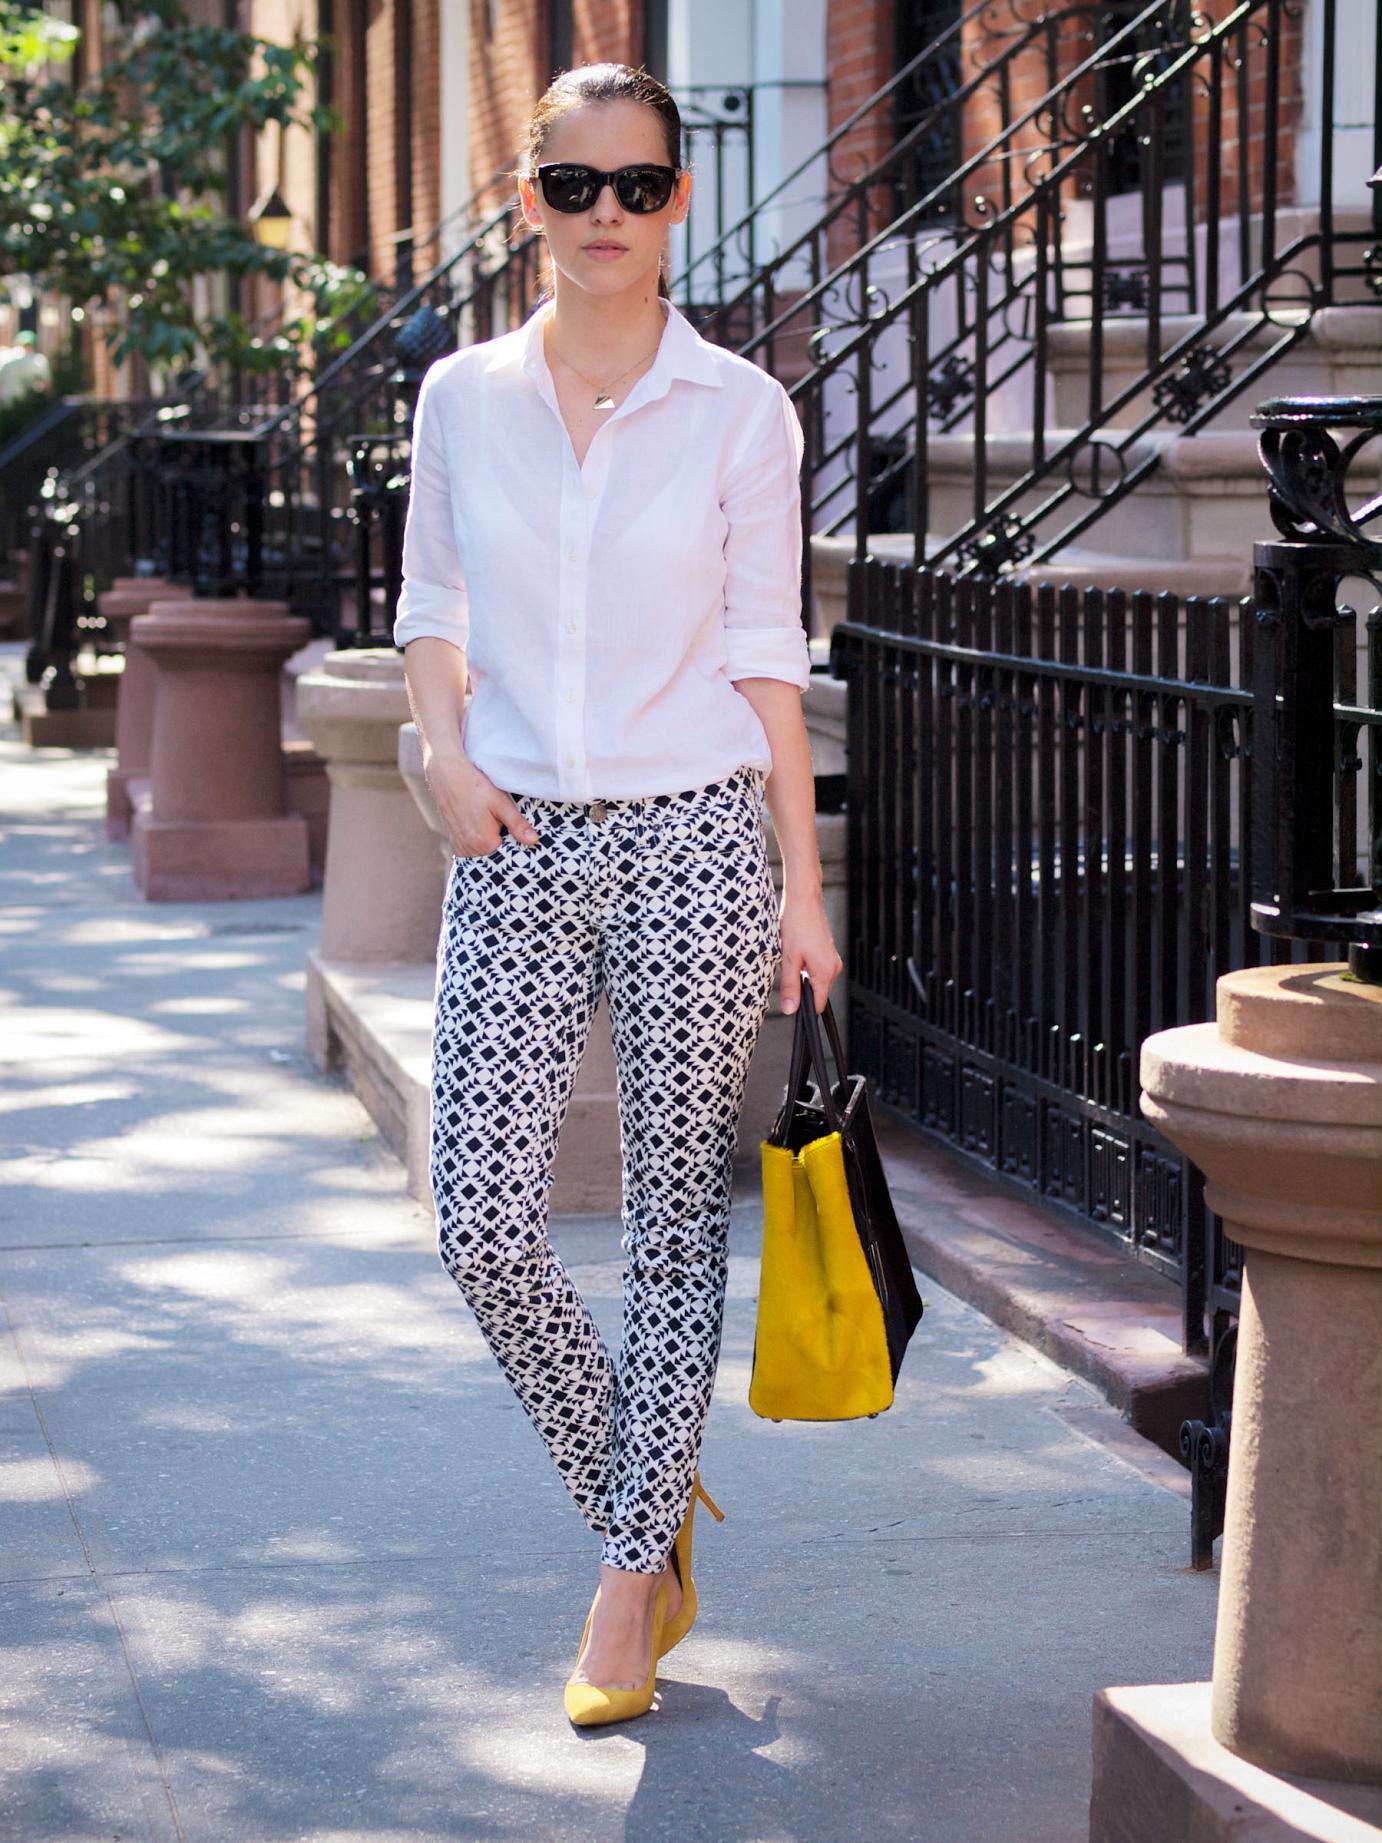 bittersweet colours, new york, street style, J.Crew jeans, Printed jeans, fendi bag, 2jours fendi bag, summer